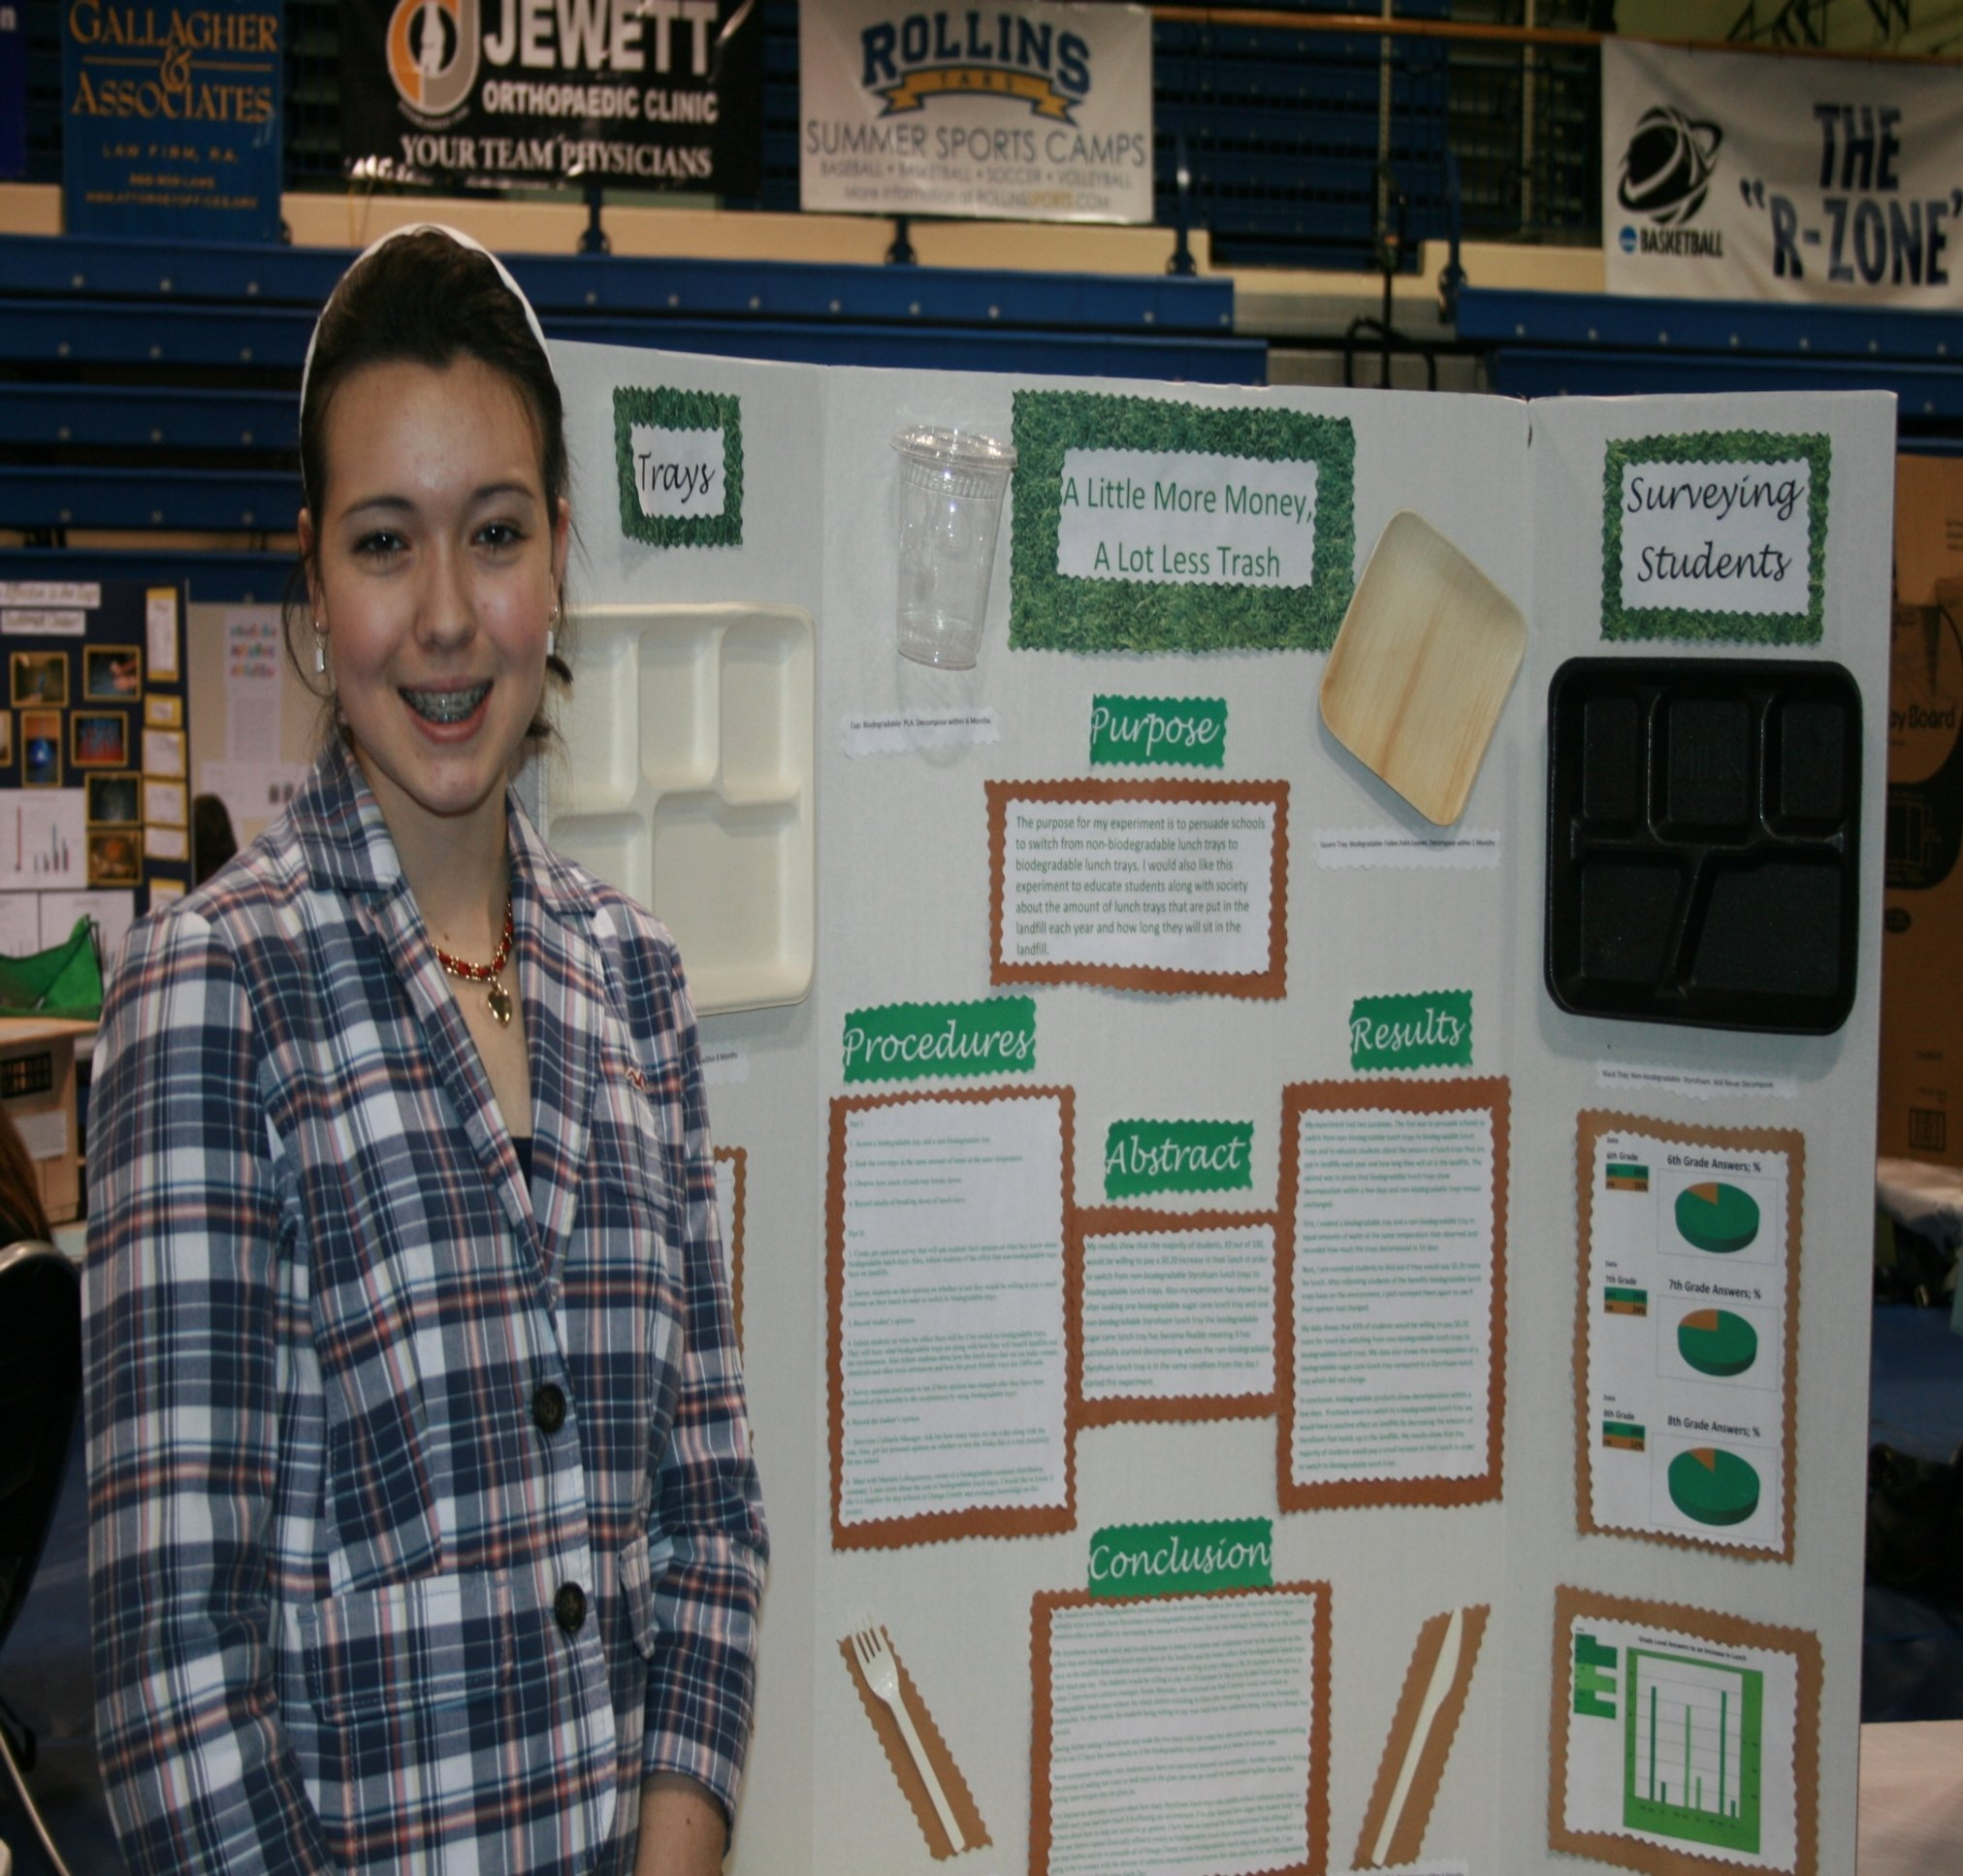 10 Best Science Fair Project Ideas List 8th grade science project ideas list homeshealth 62 2020